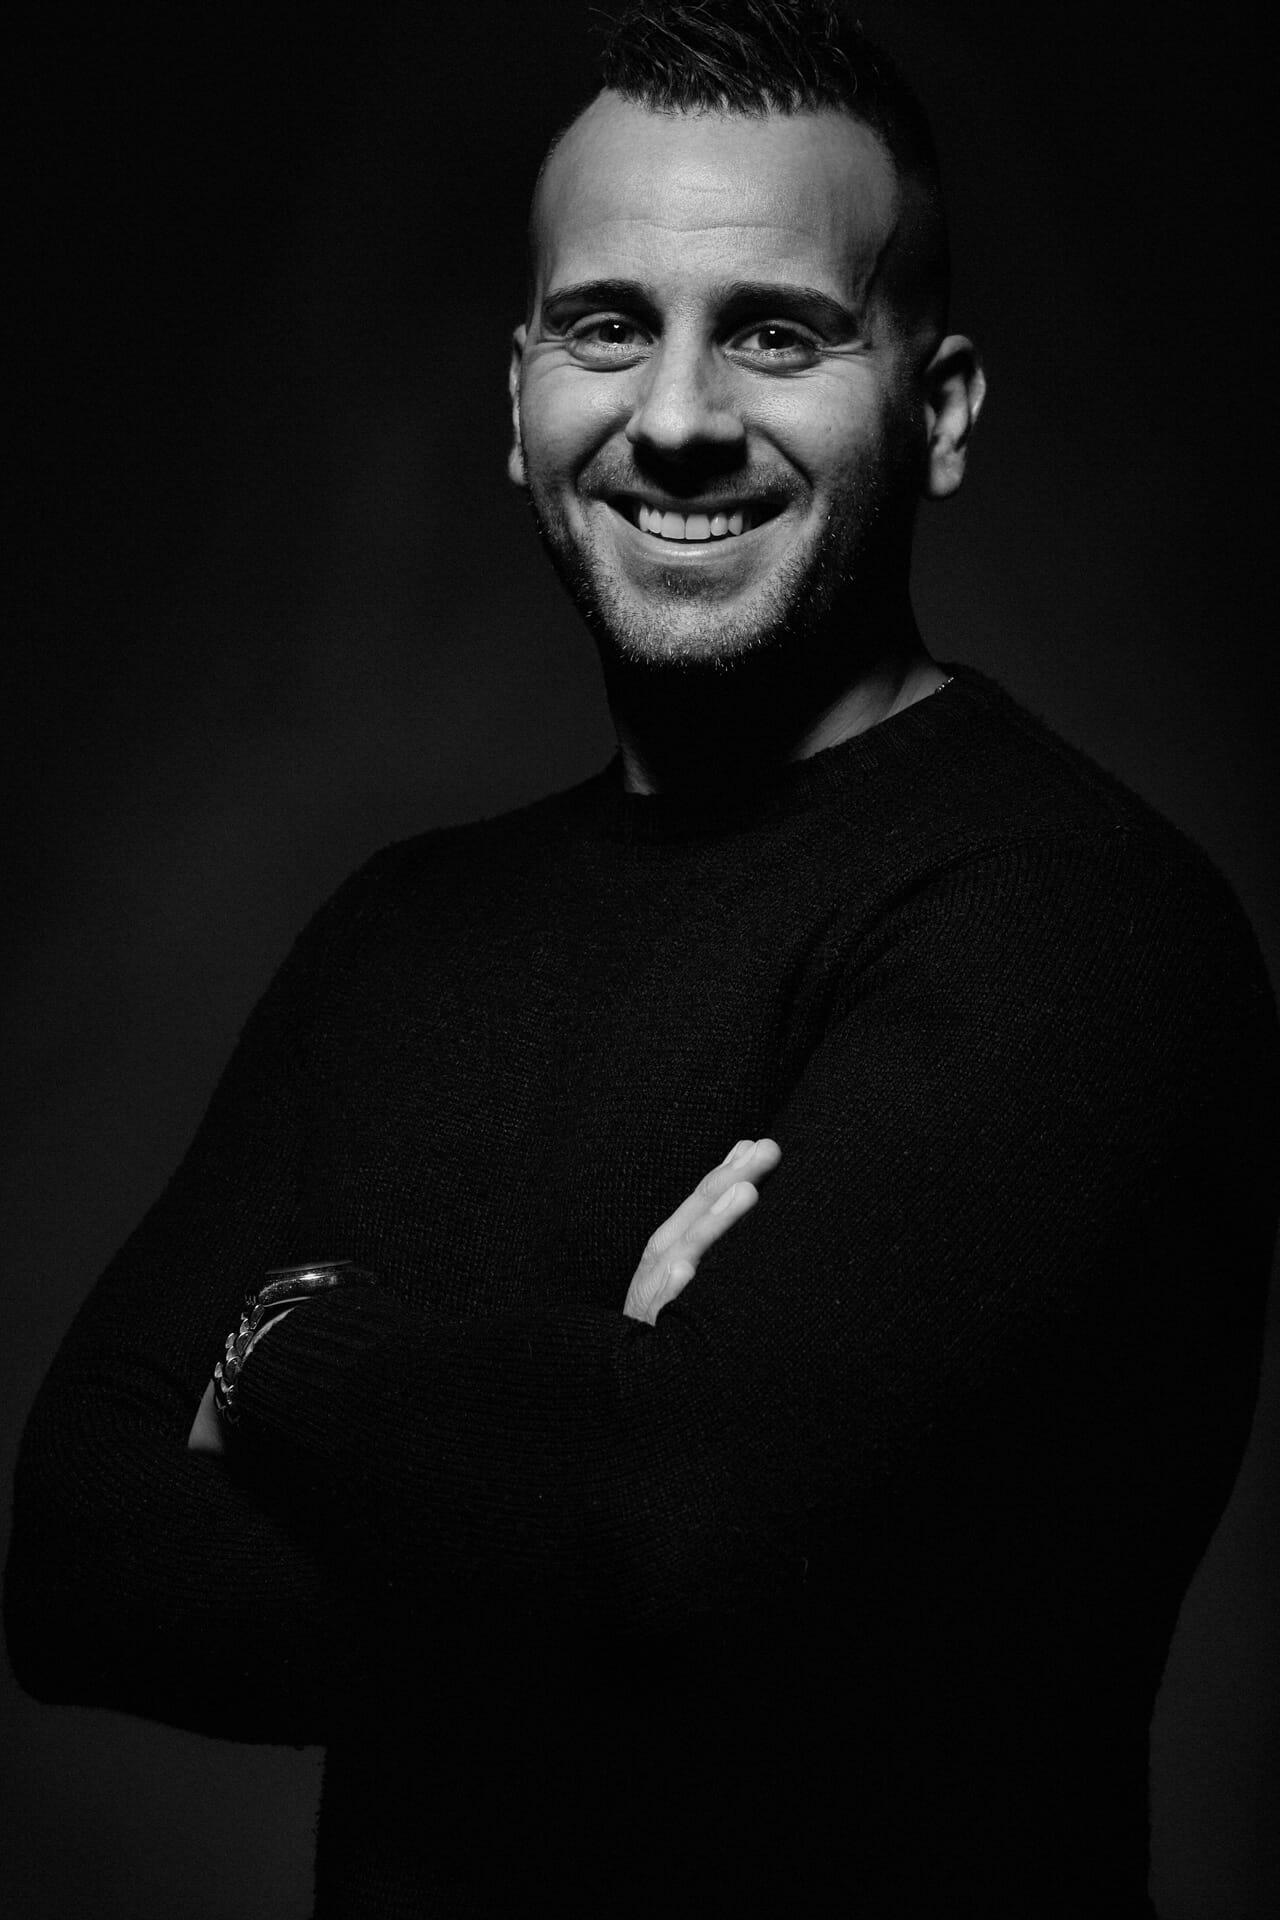 Corporate portrait CLAUDIO Daniel Grandolfi professional portrait photographer Milano photographer Fashion and Beauty Tortona area Advertising Photographer Porta Genova photographer editorial magazines Vogue Profoto Lighting Canon Cameras 1